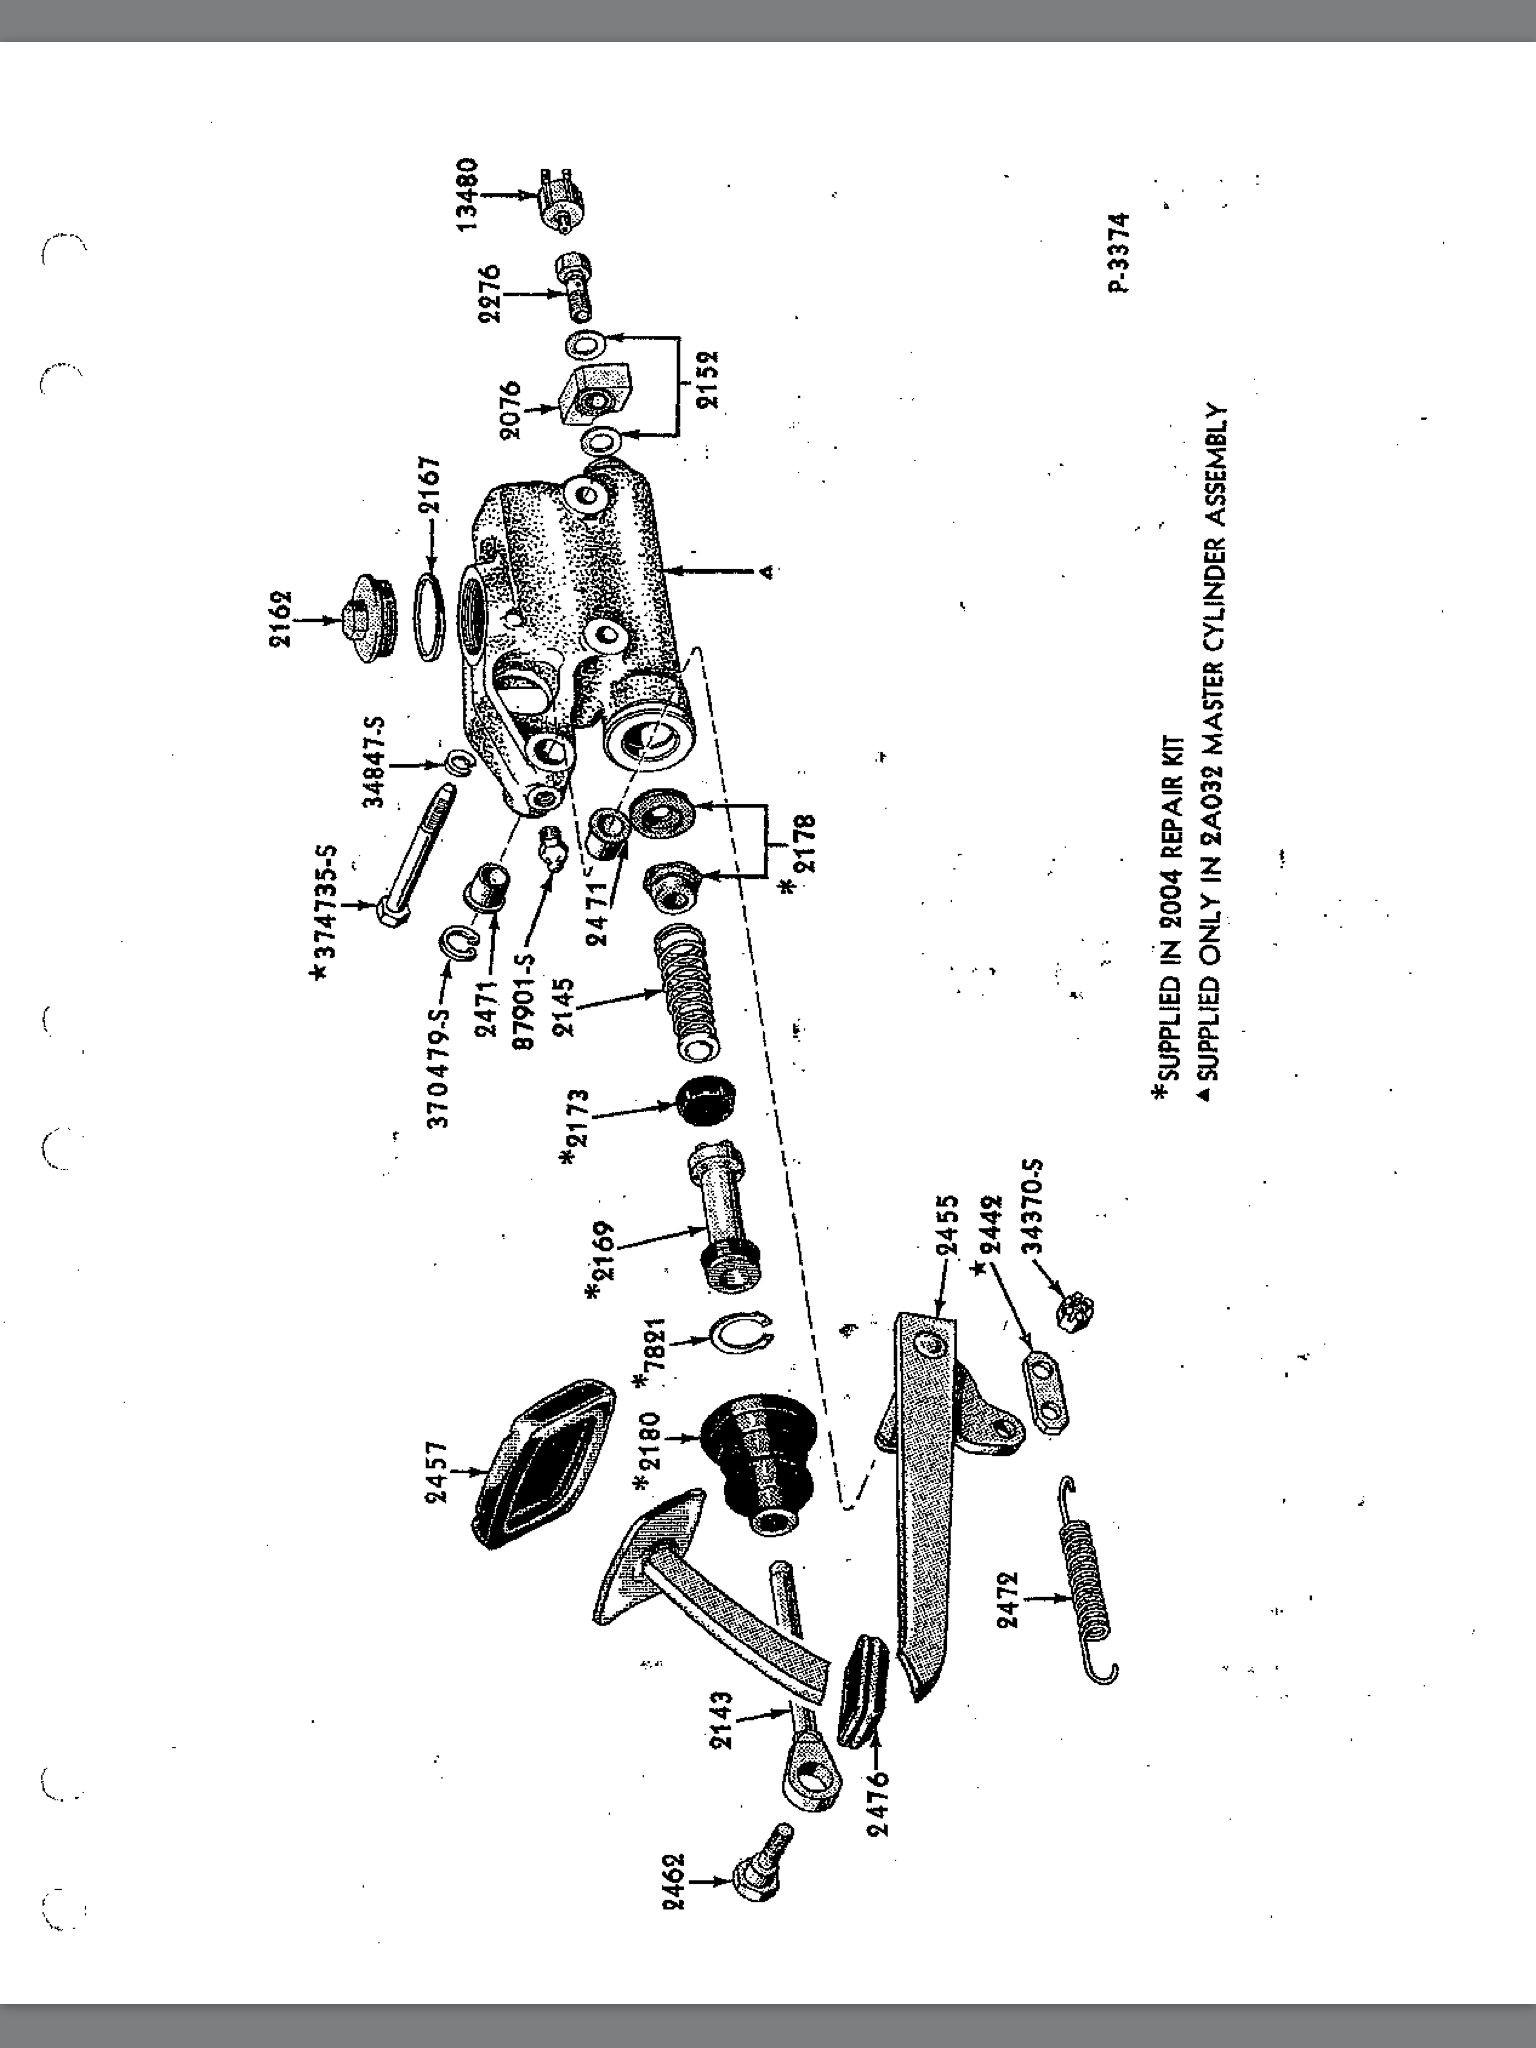 Chevy Master Cylinder Diagram